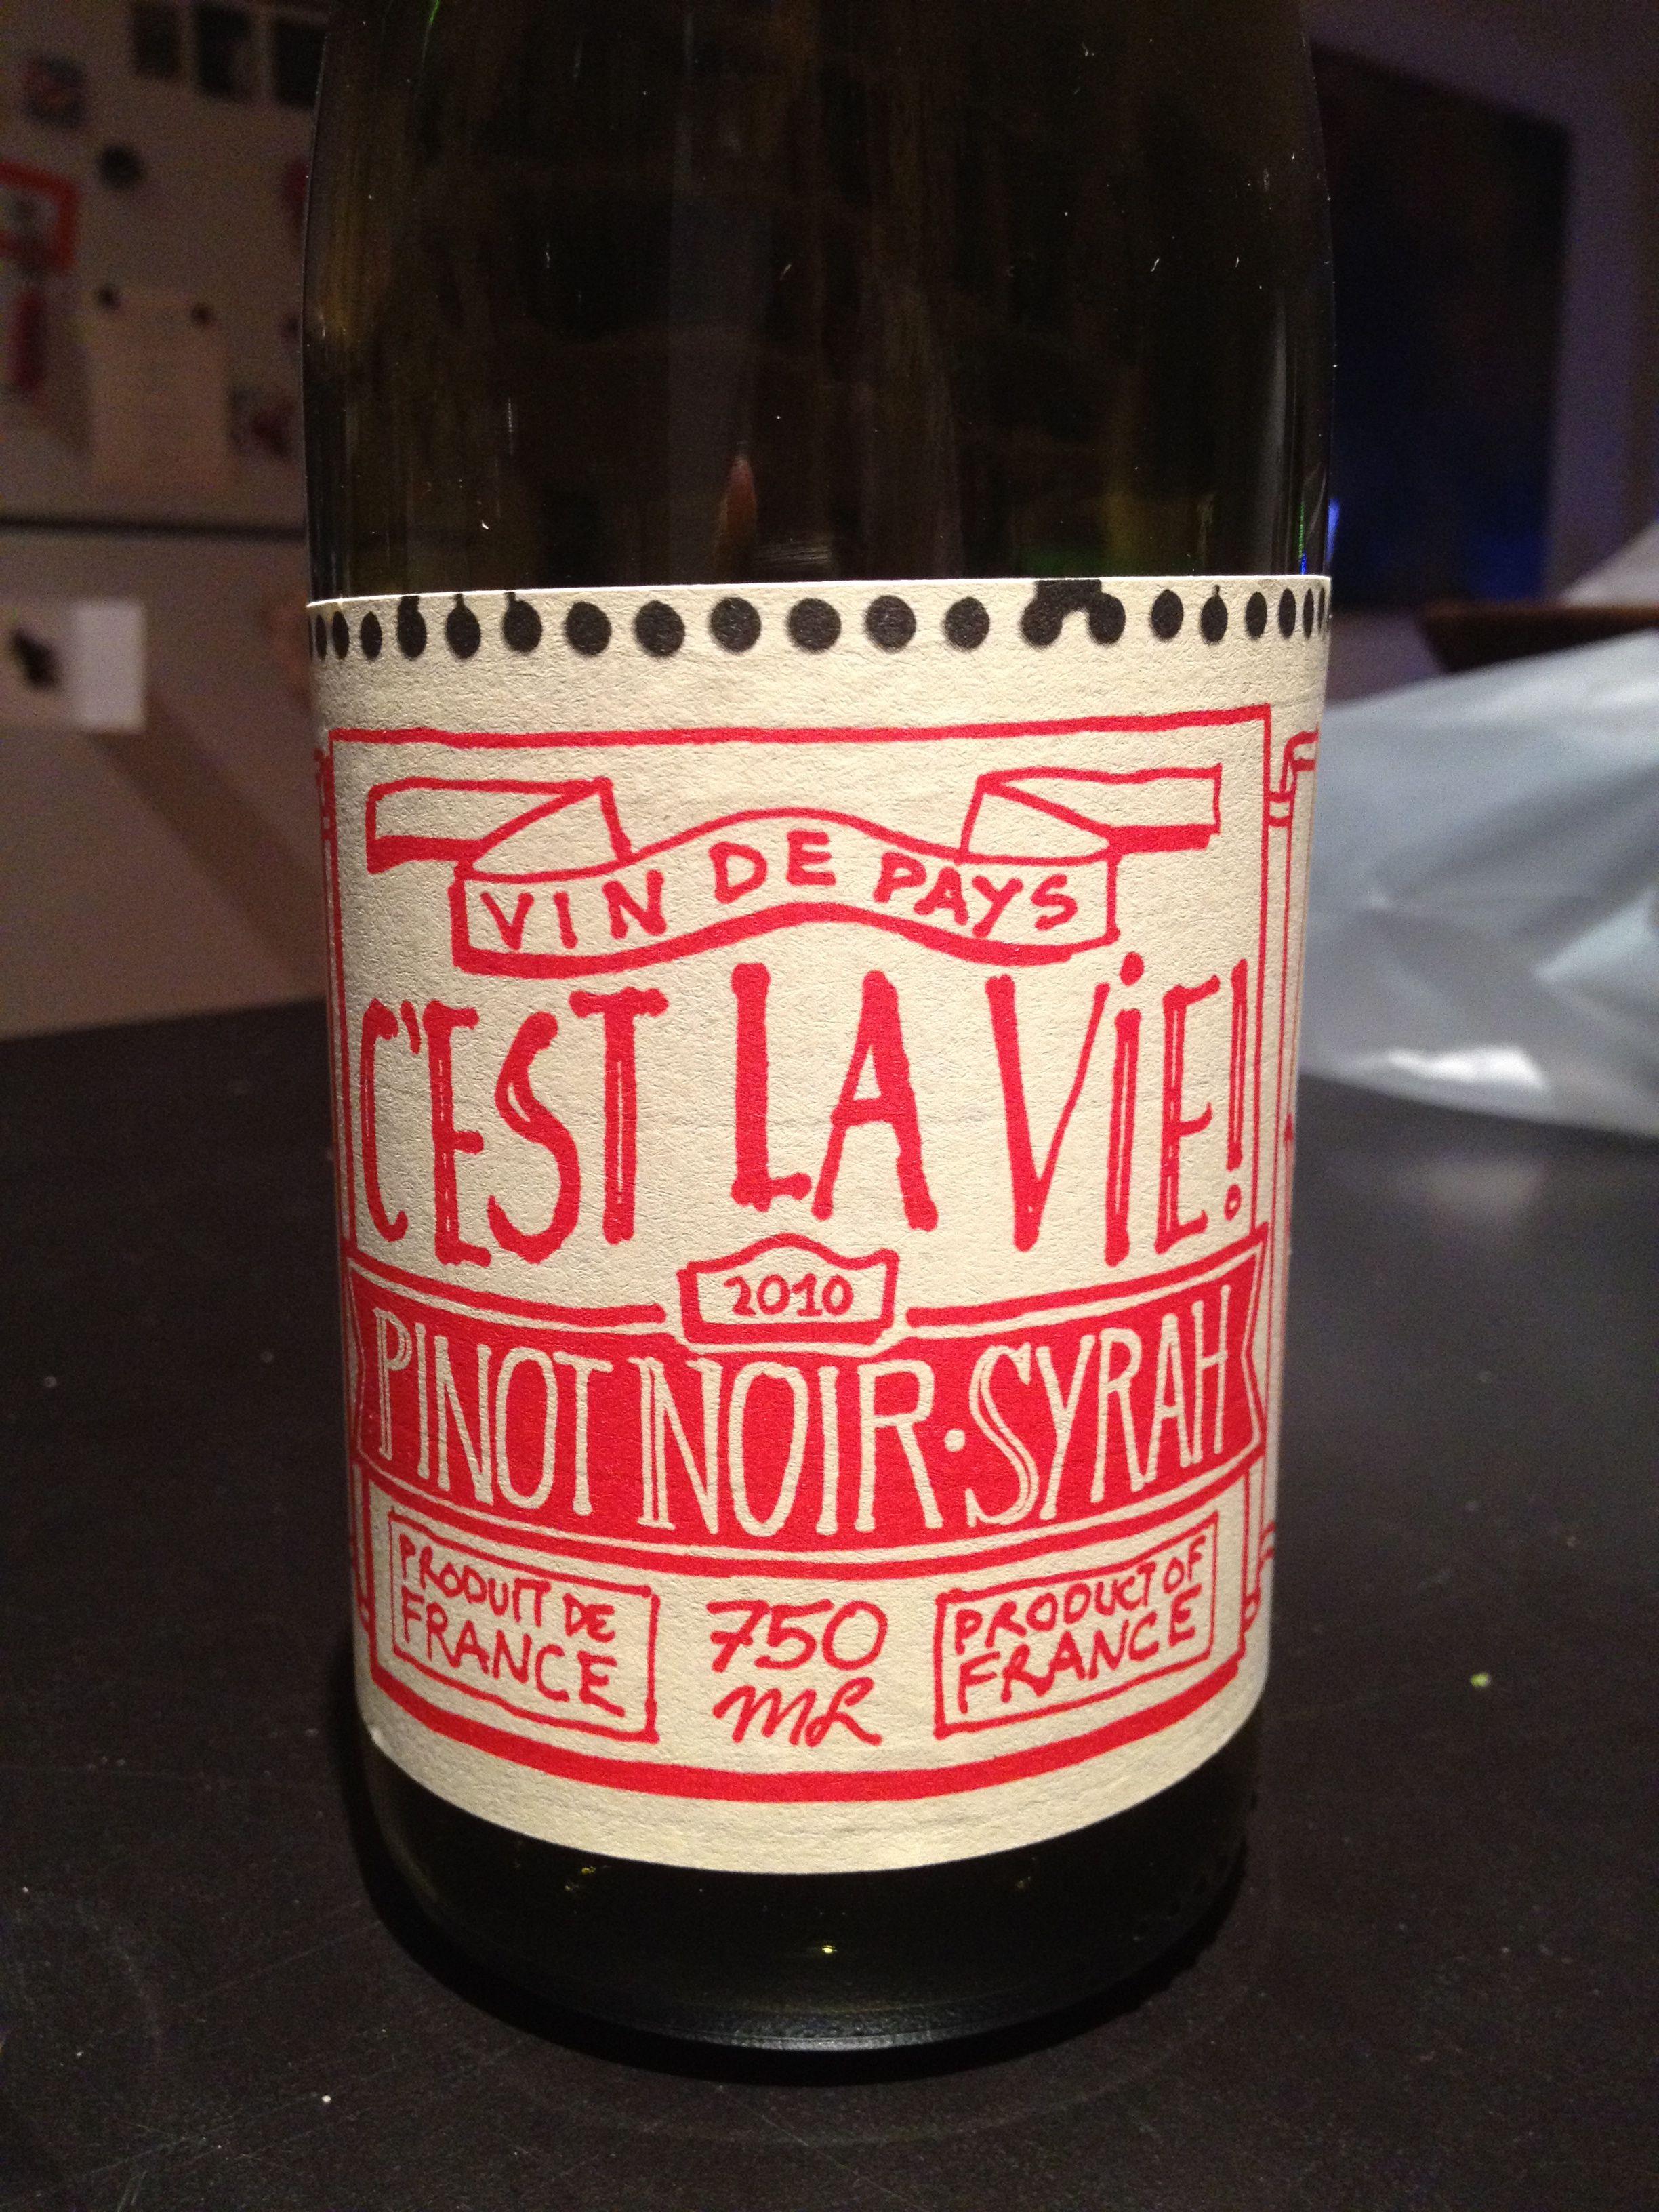 C Est La Vie Pinot Noir Syrah 2010 France Wine Label Pinot Noir Syrah